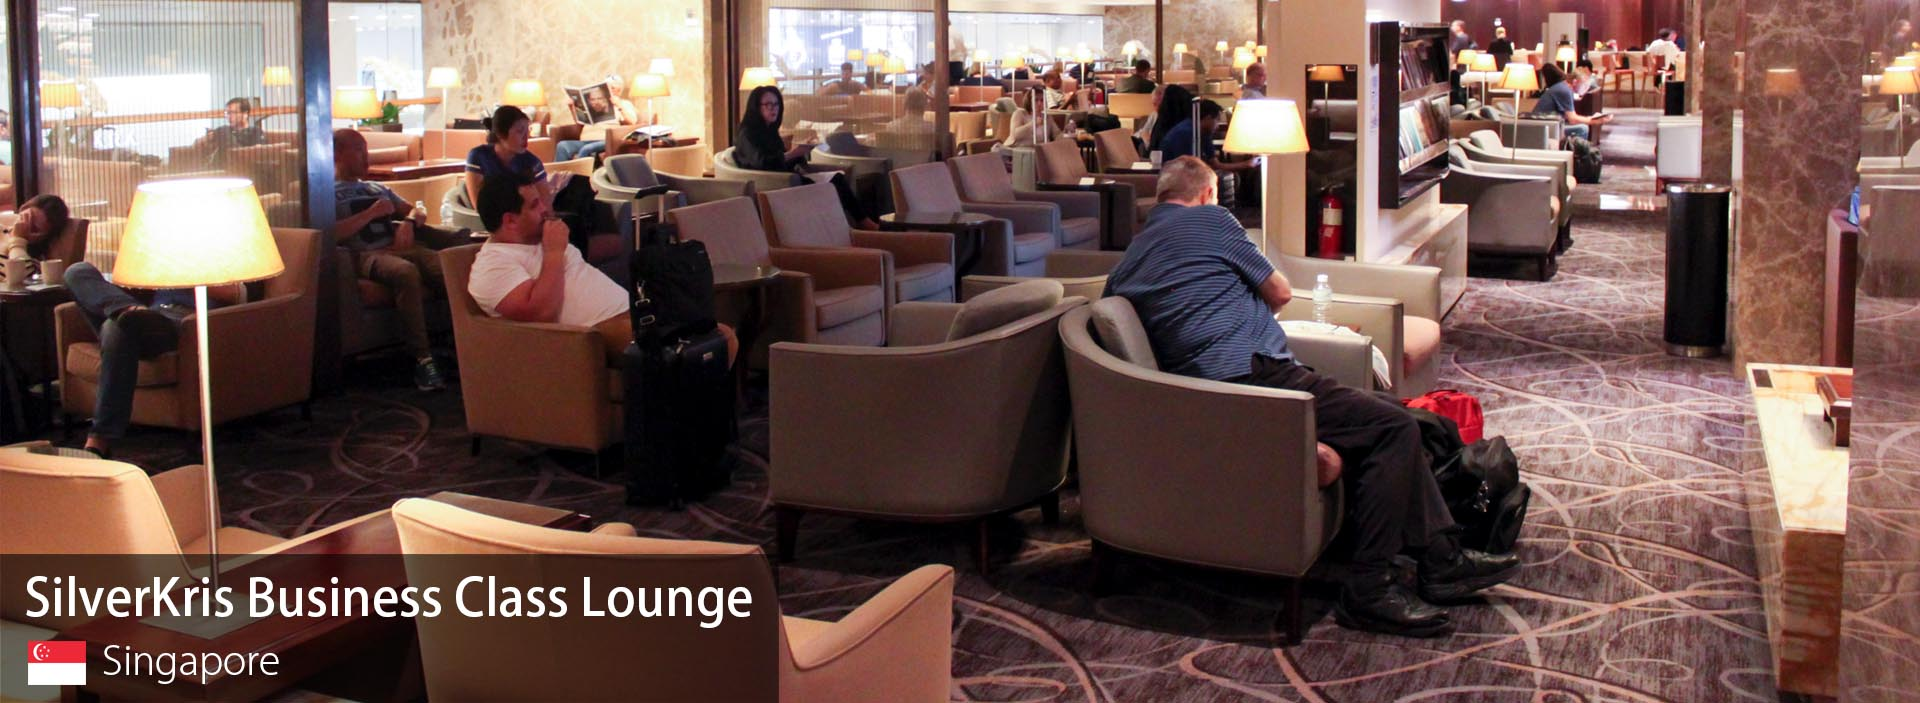 Review: Singapore Airlines SilverKris Lounge at Singapore Changi (Terminal 3)